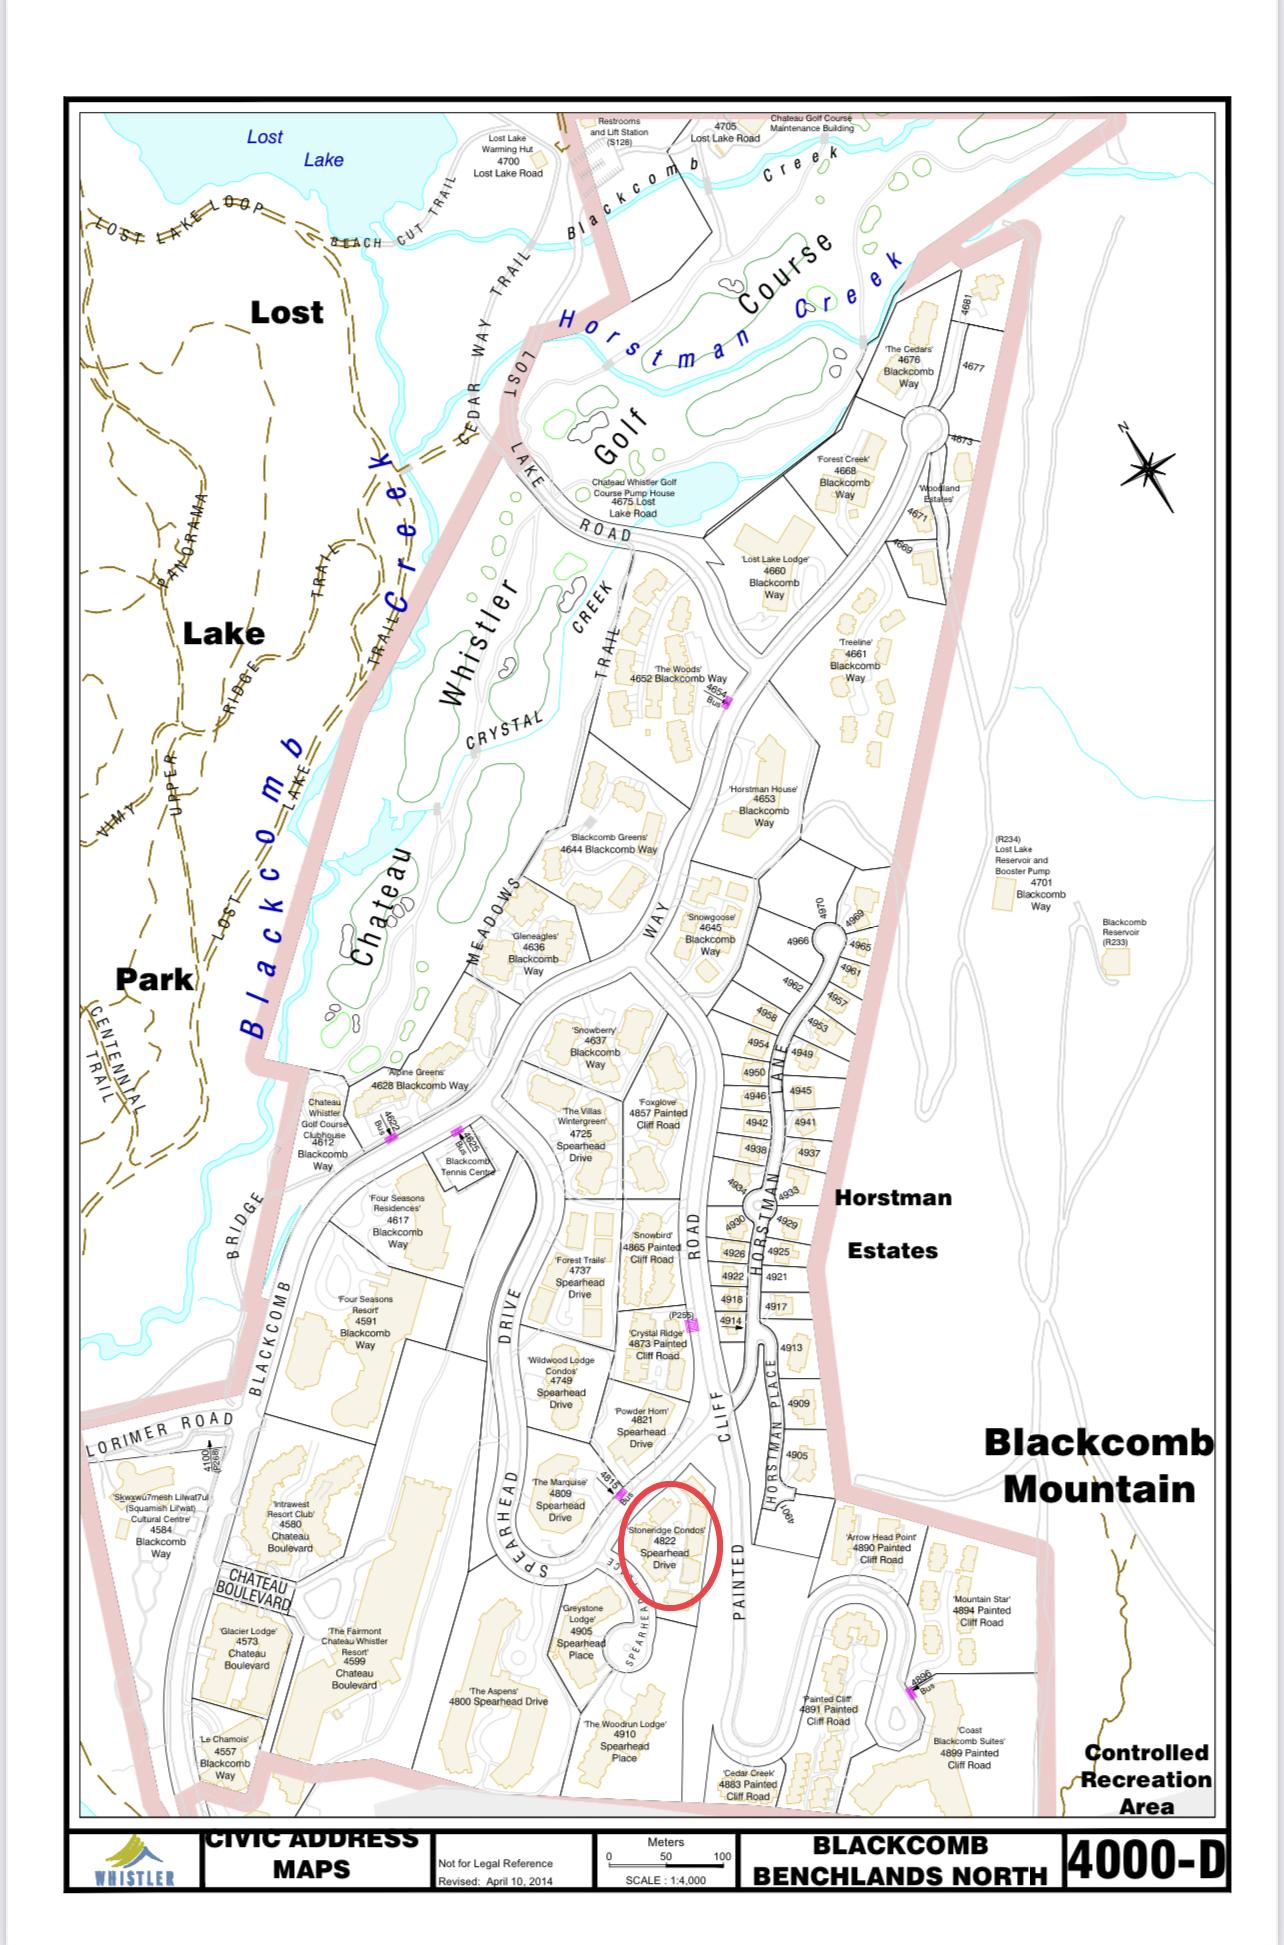 Stone Ridge Civic Address Map